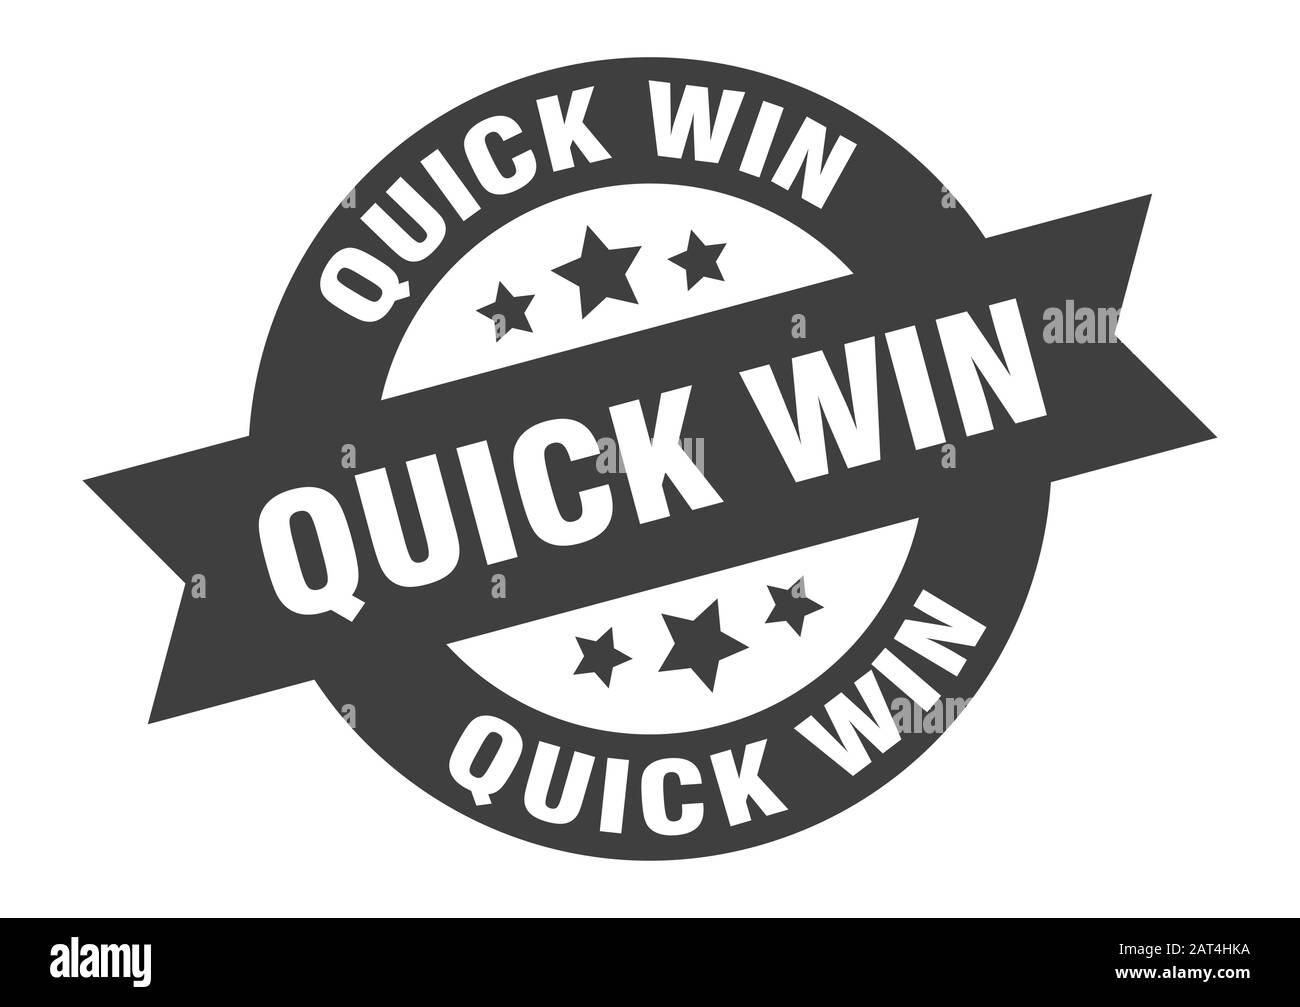 Quickwin betting girne american gbdfed binary options